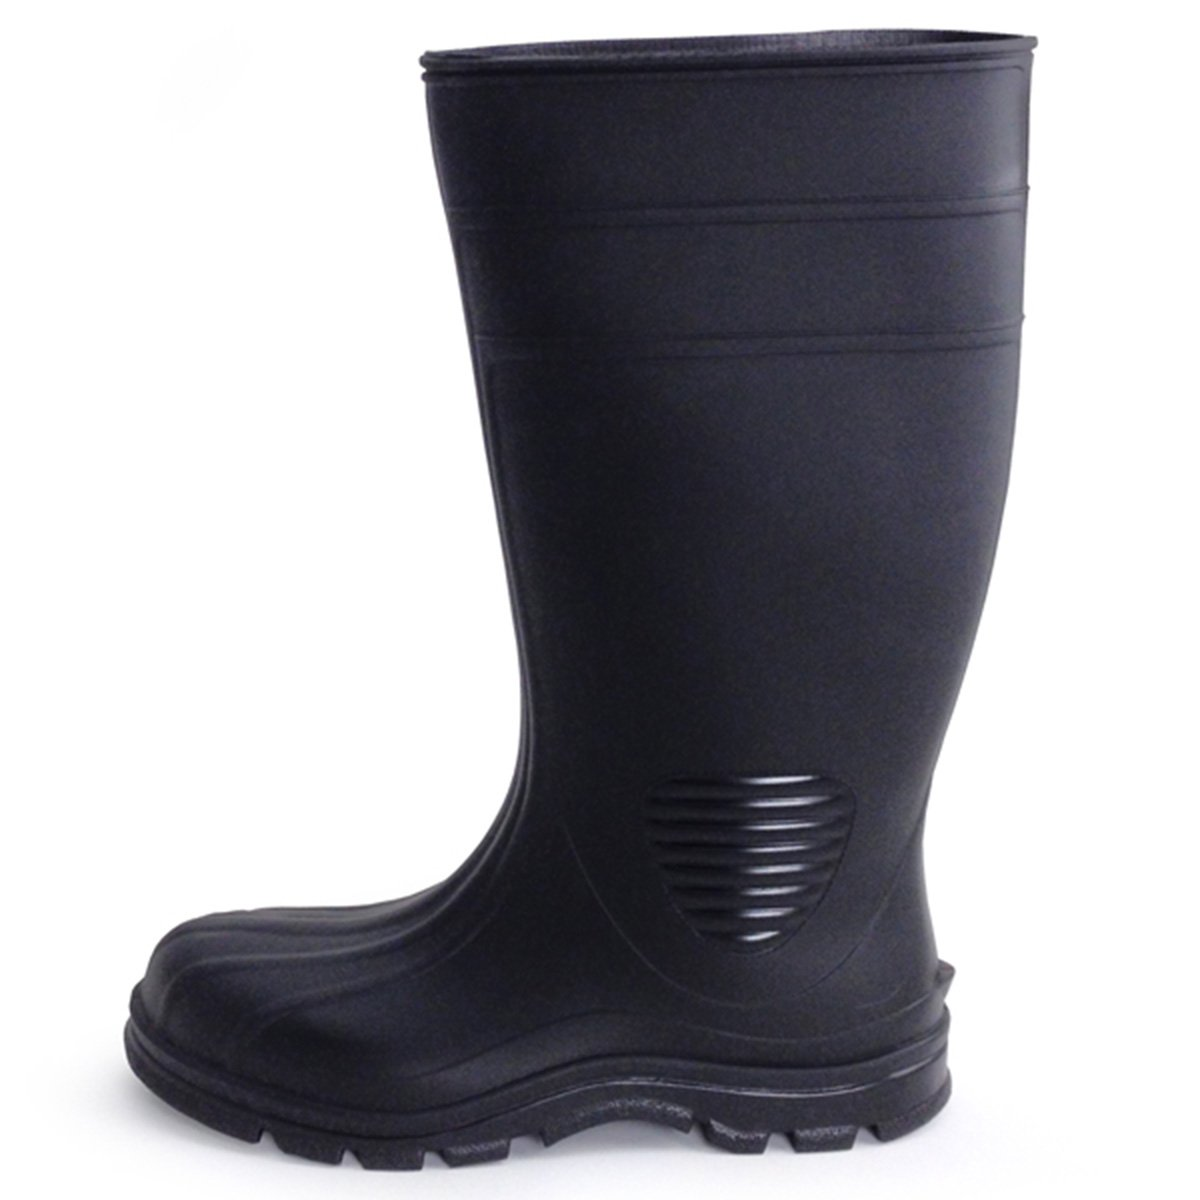 UltraSource 444106-6 Economy PVC Boots, Black, Steel Toe, Size 6